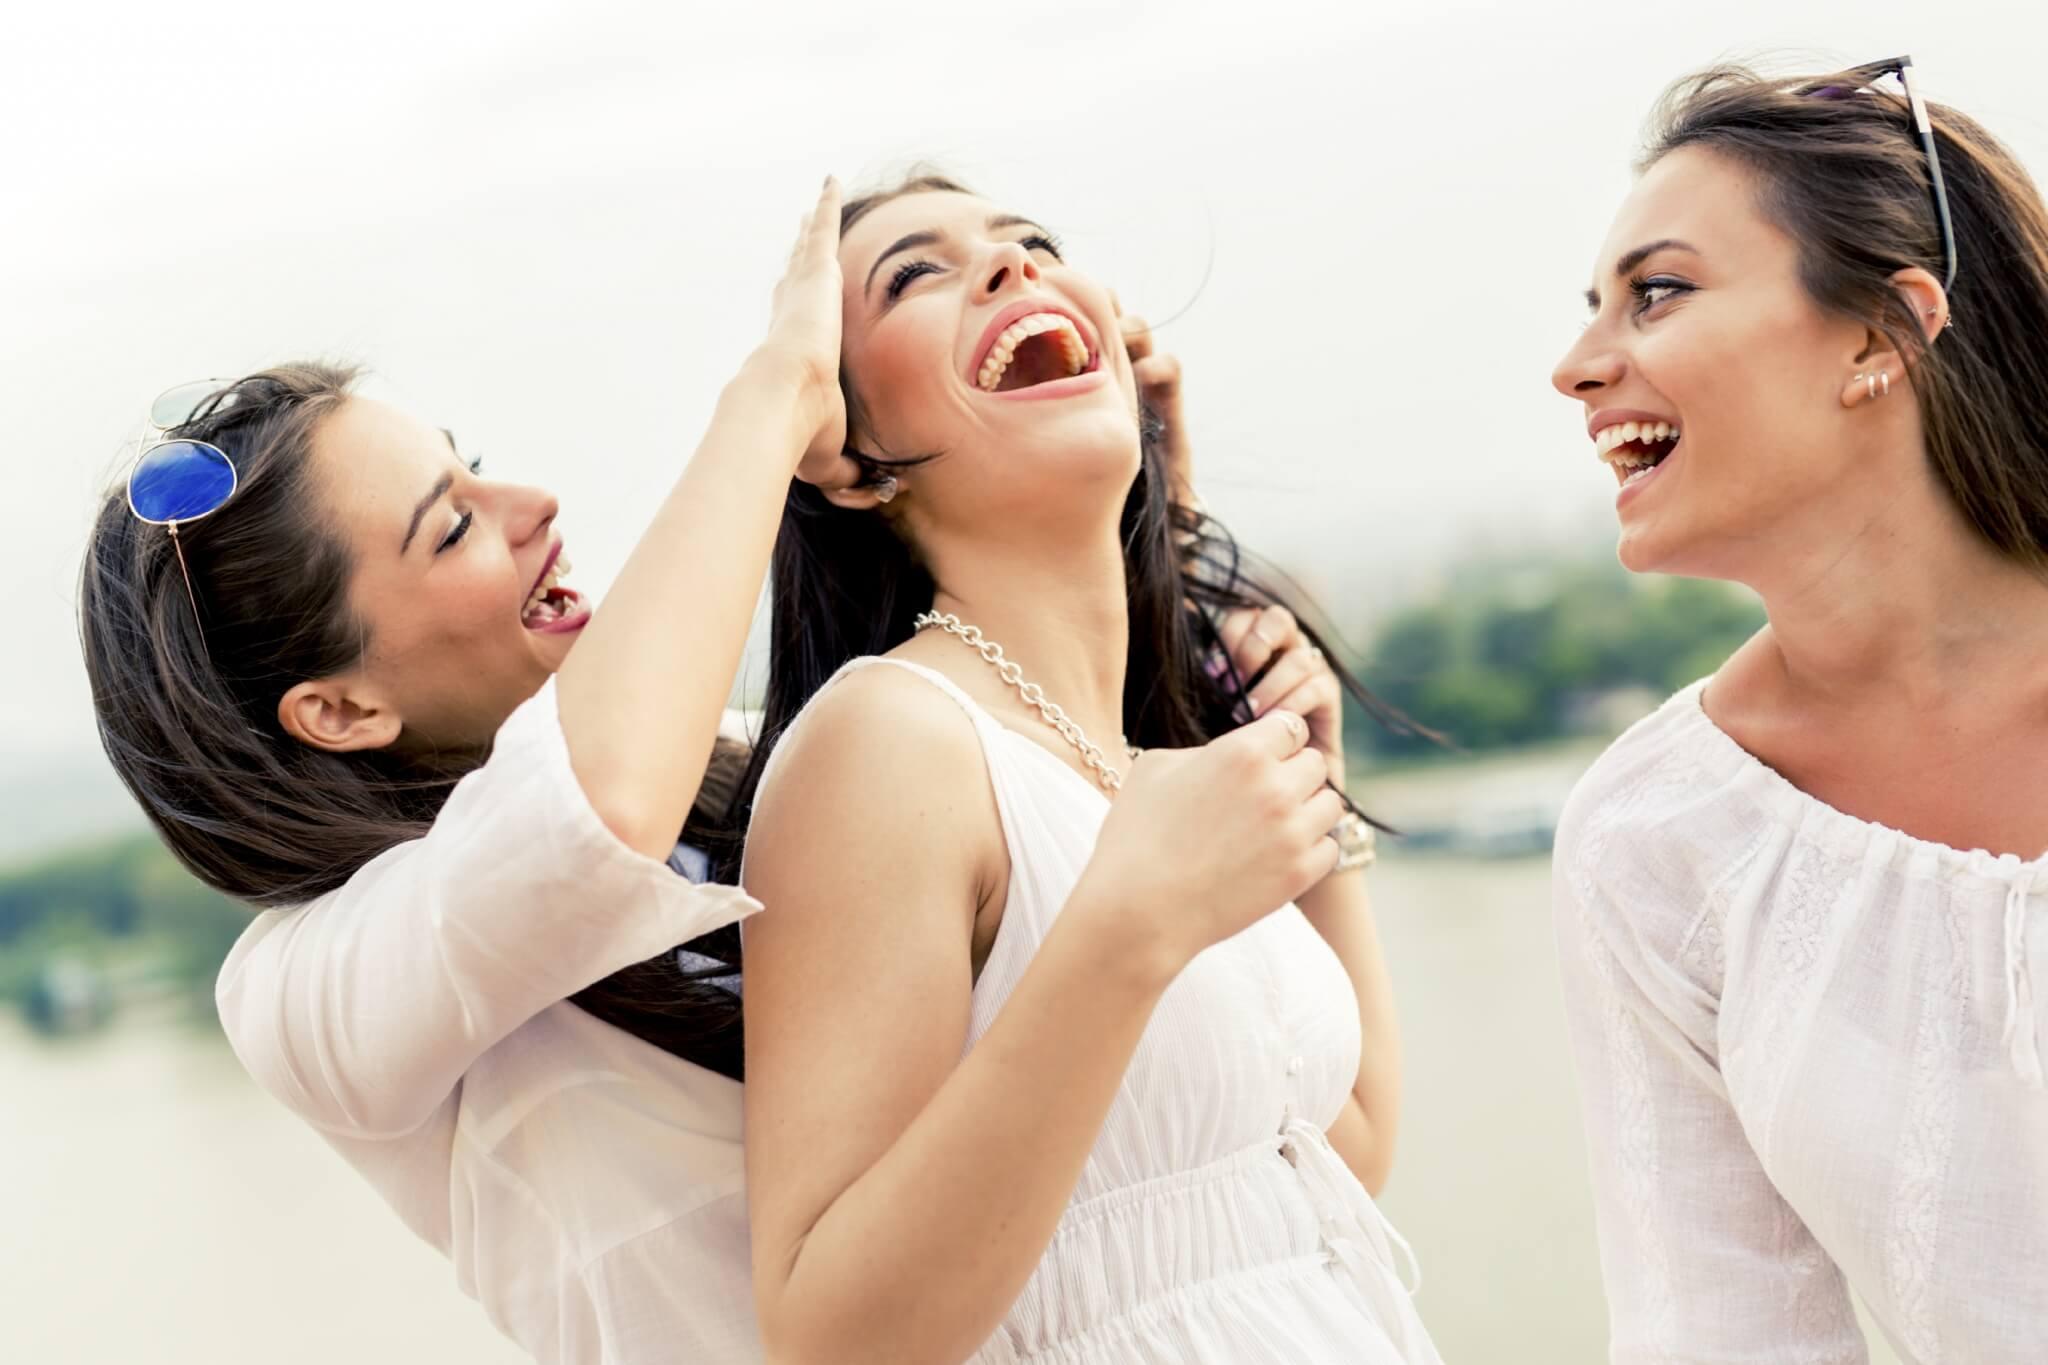 Cheerful-women-having-fun-outdoors-000072923775_Large.jpg.jpeg